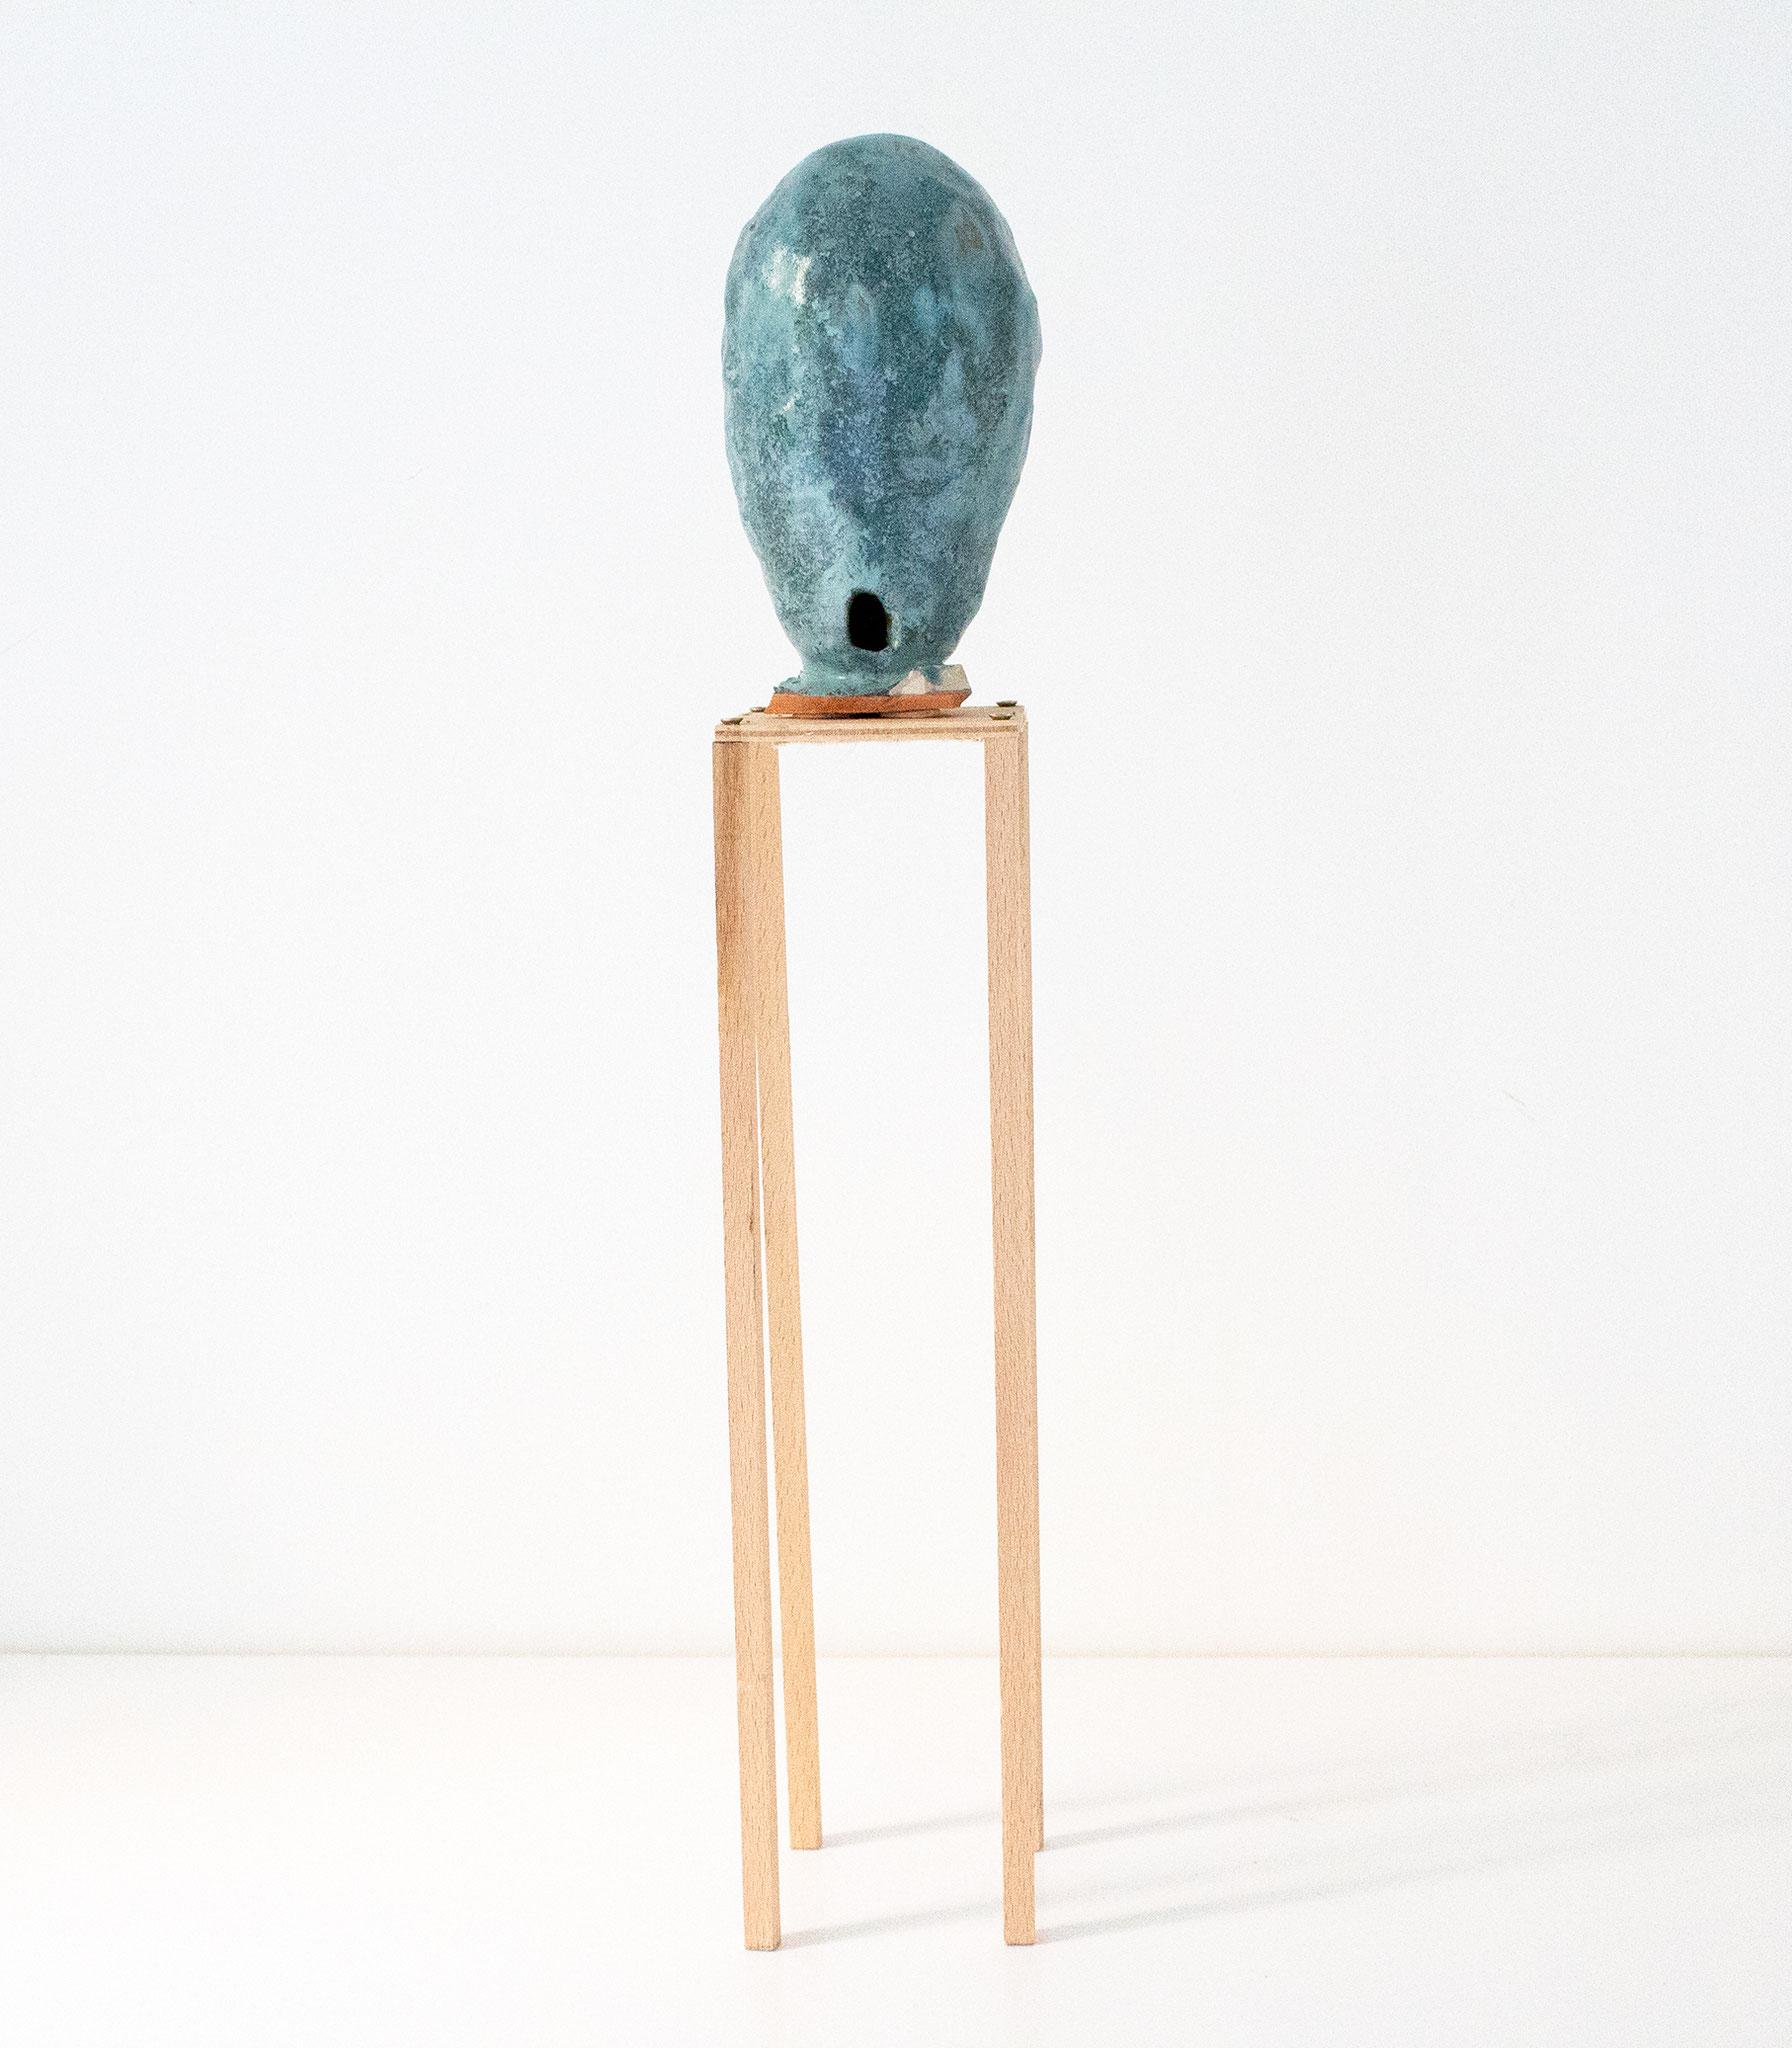 Wasserturm_Keramik, Glasur,Tonscherbe,Holz_46 x 8 x 8_2018